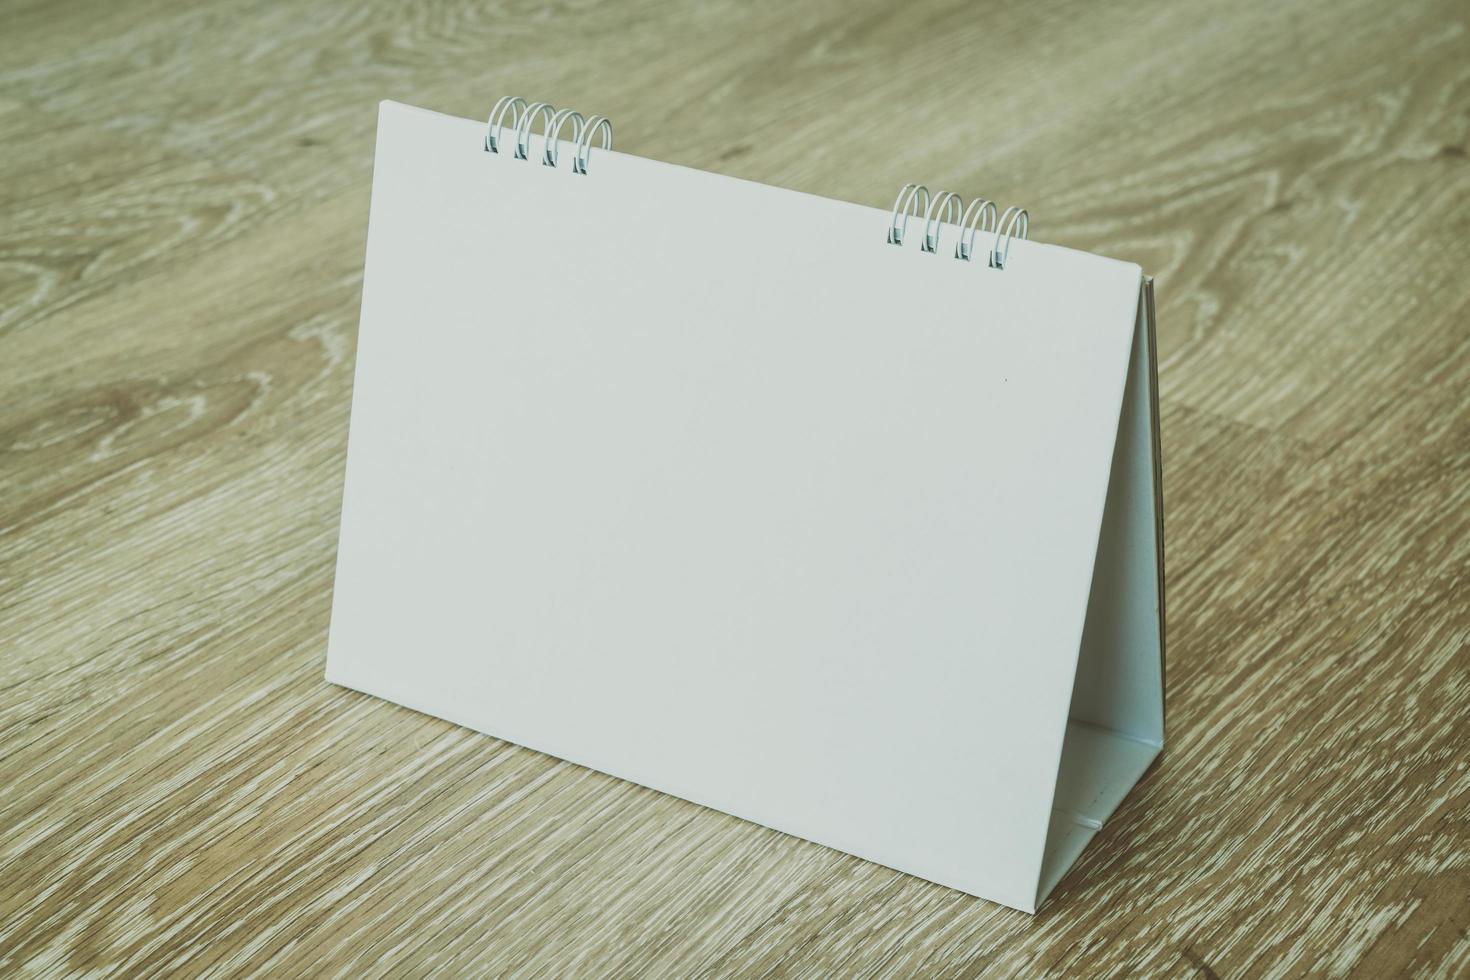 lege kalender op houten achtergrond foto